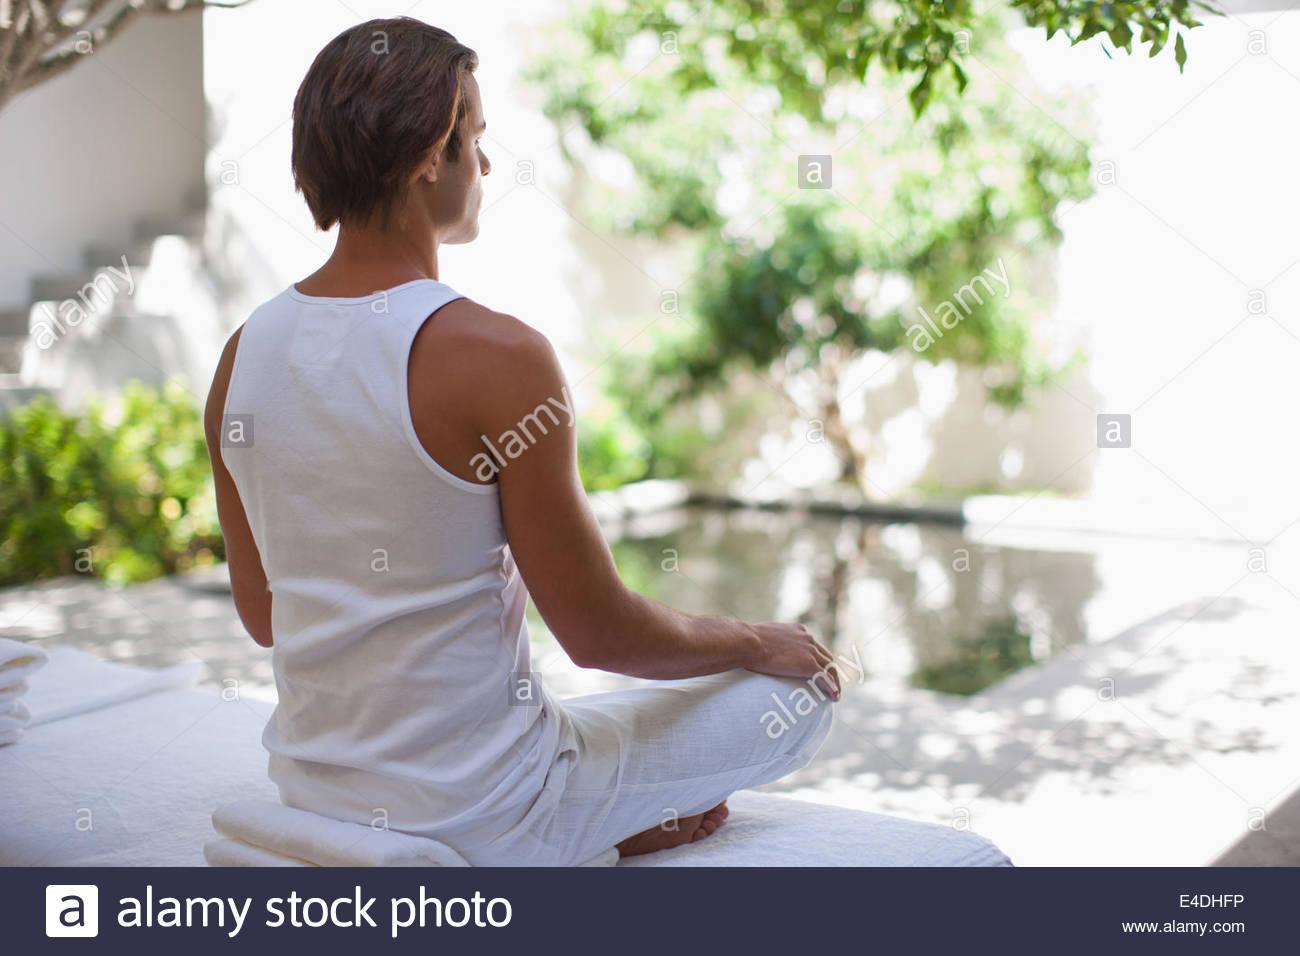 Man sitting cross-legged at poolside - Stock Image